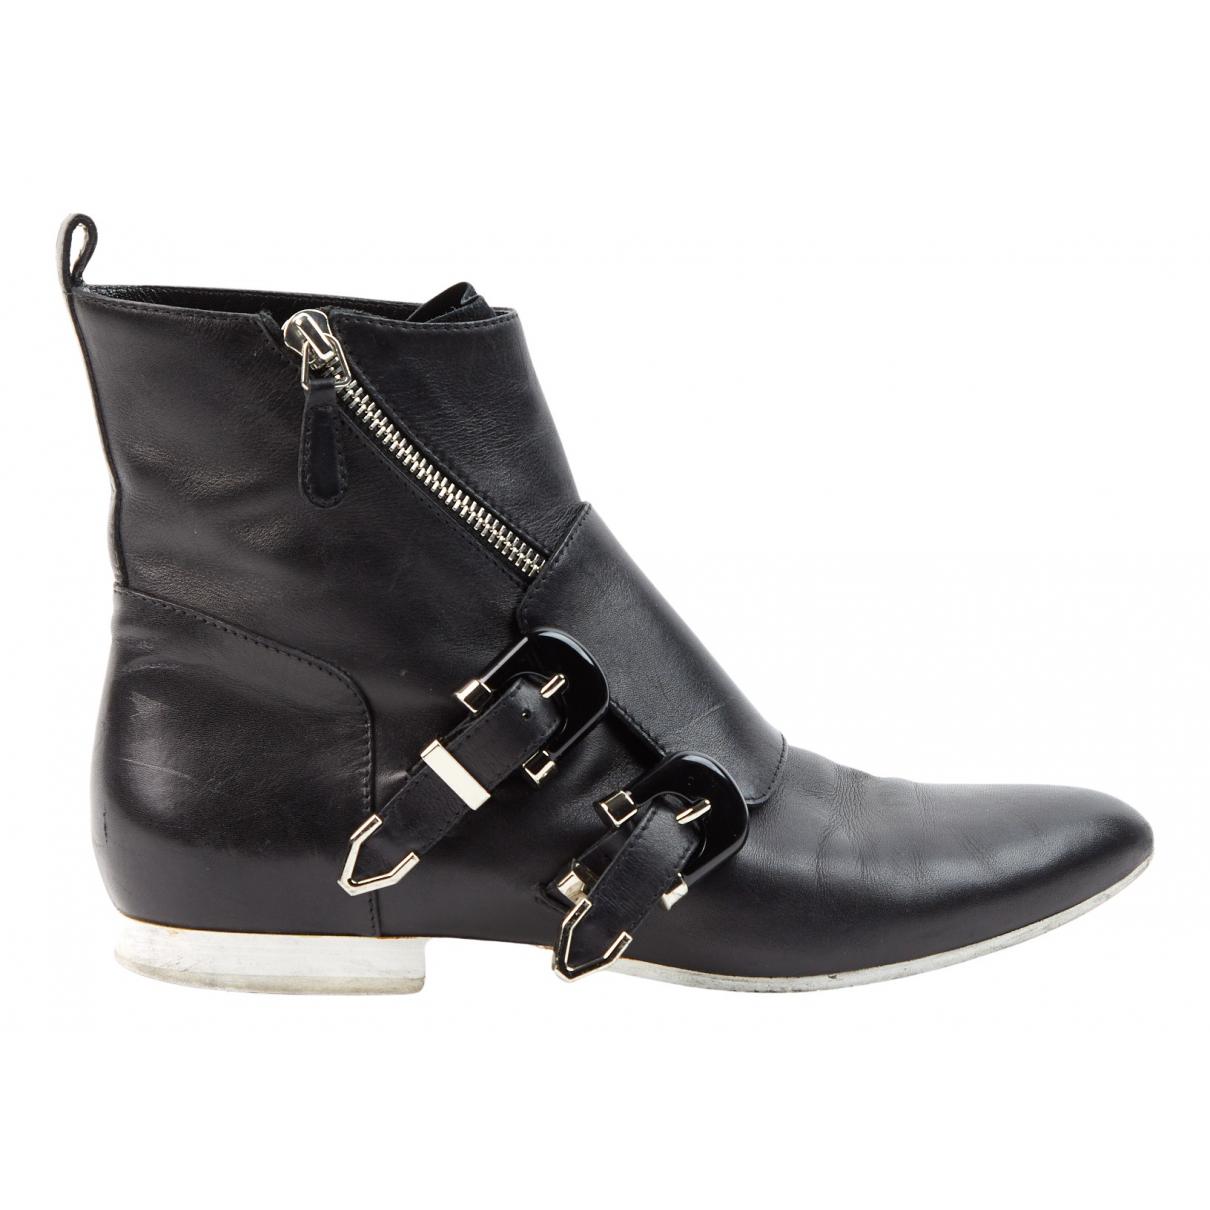 Balenciaga N Black Leather Ankle boots for Women 38 EU